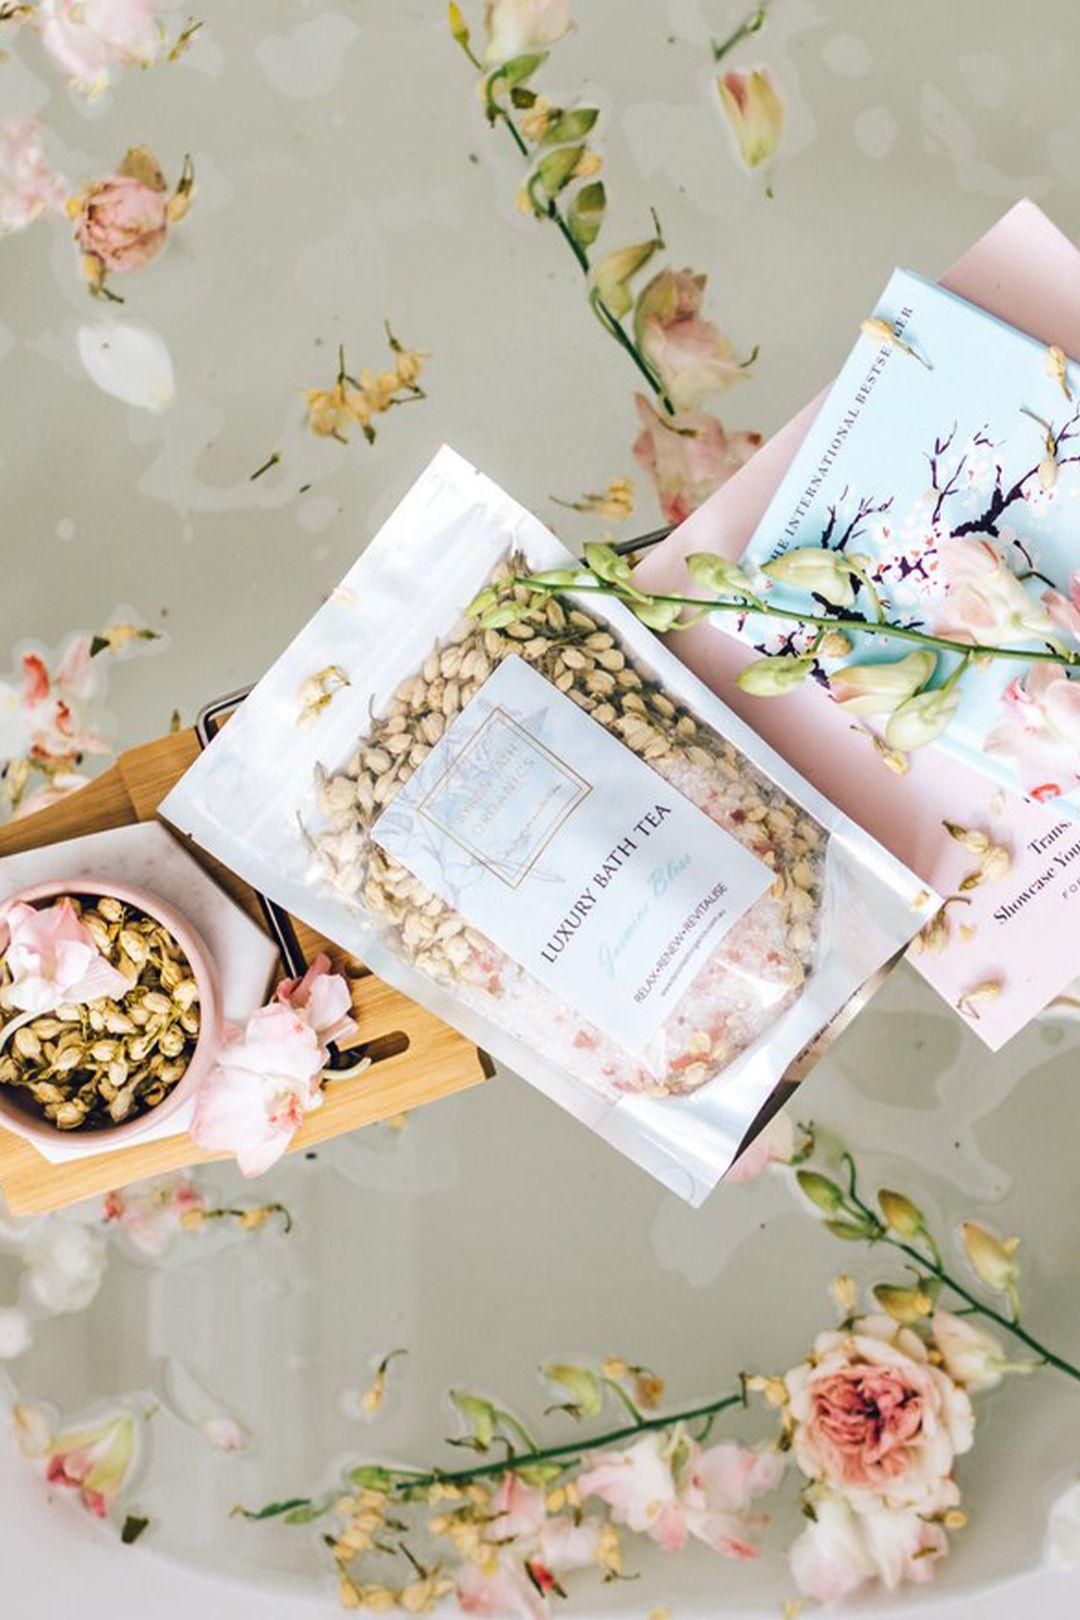 byron-bath-organics-jasmine-bliss-bath-tea